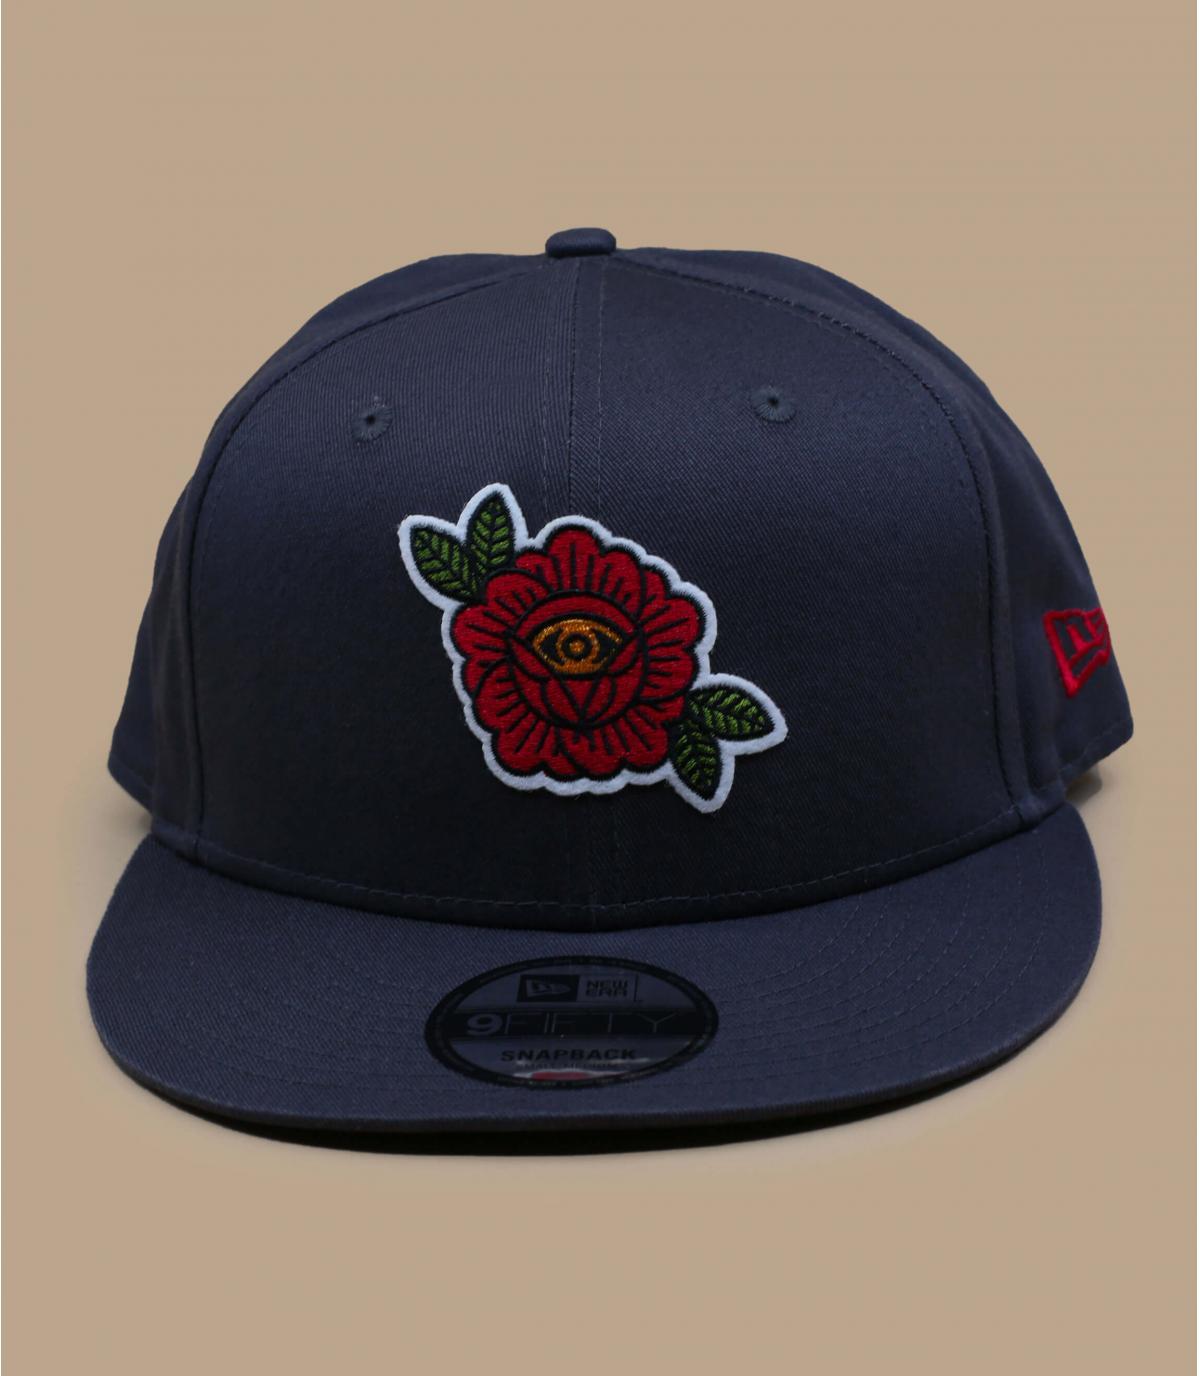 Gorra negra bordado rosa